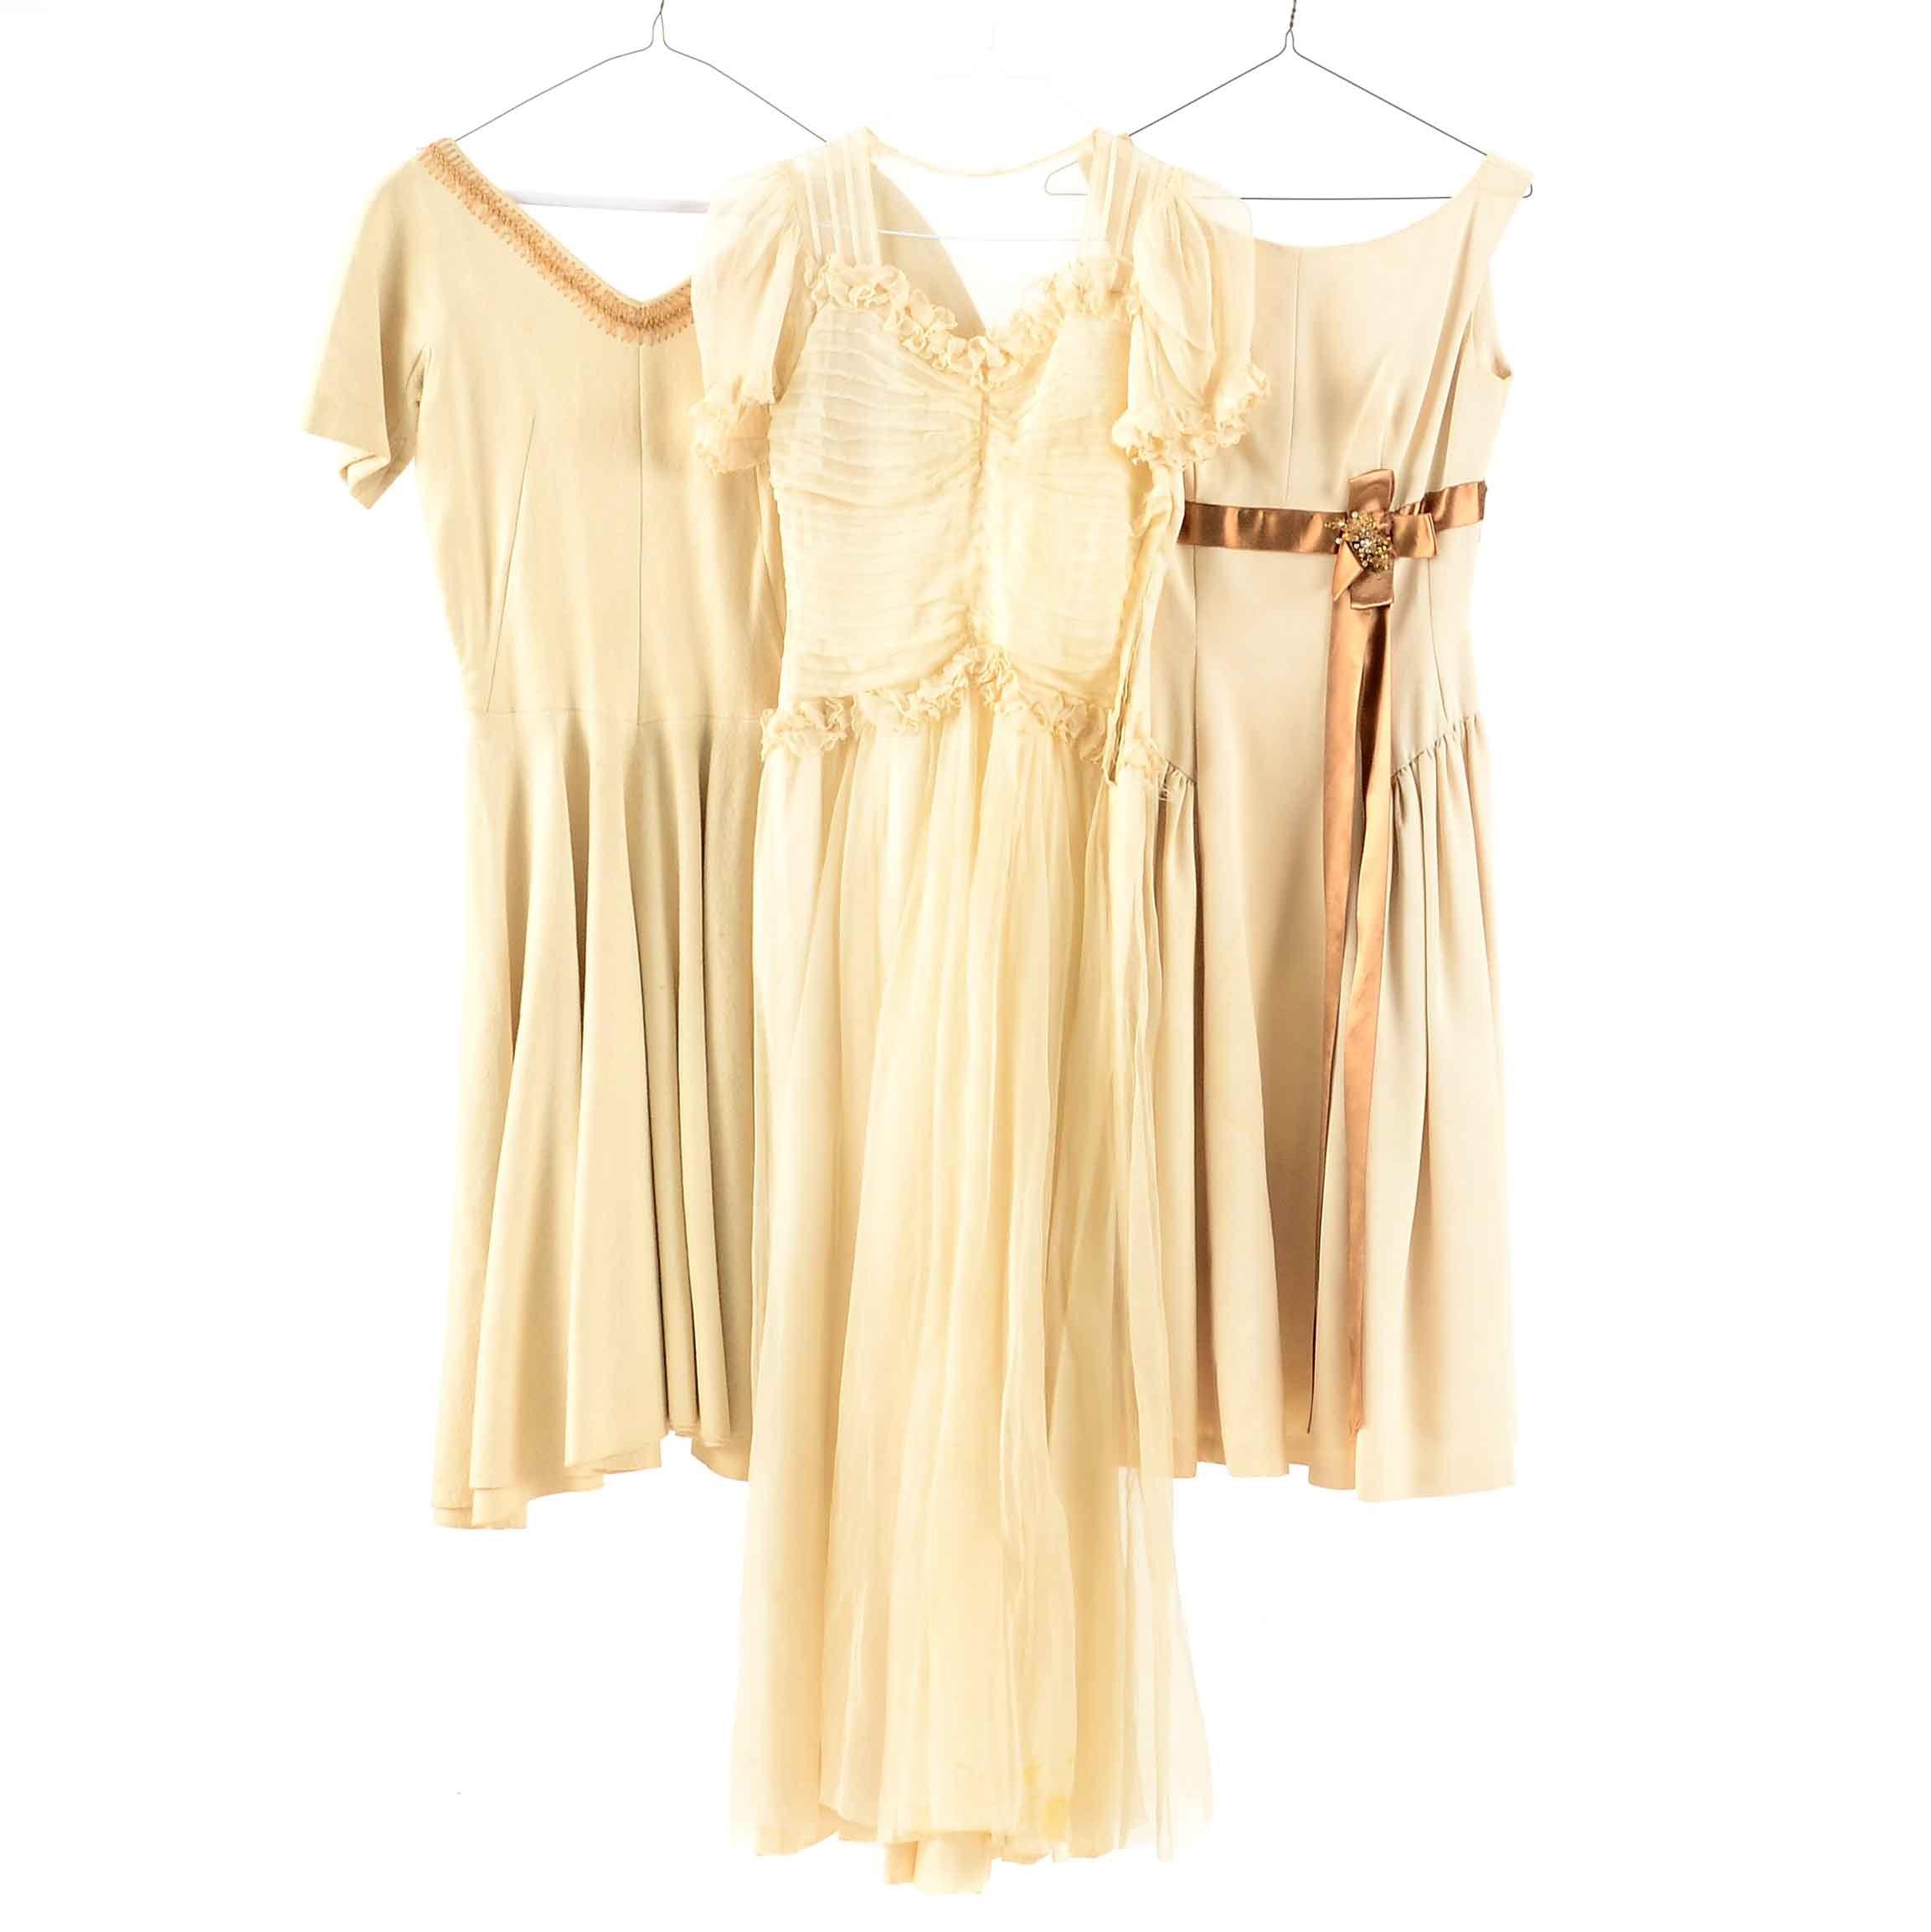 Collection of Vintage Formal Dresses